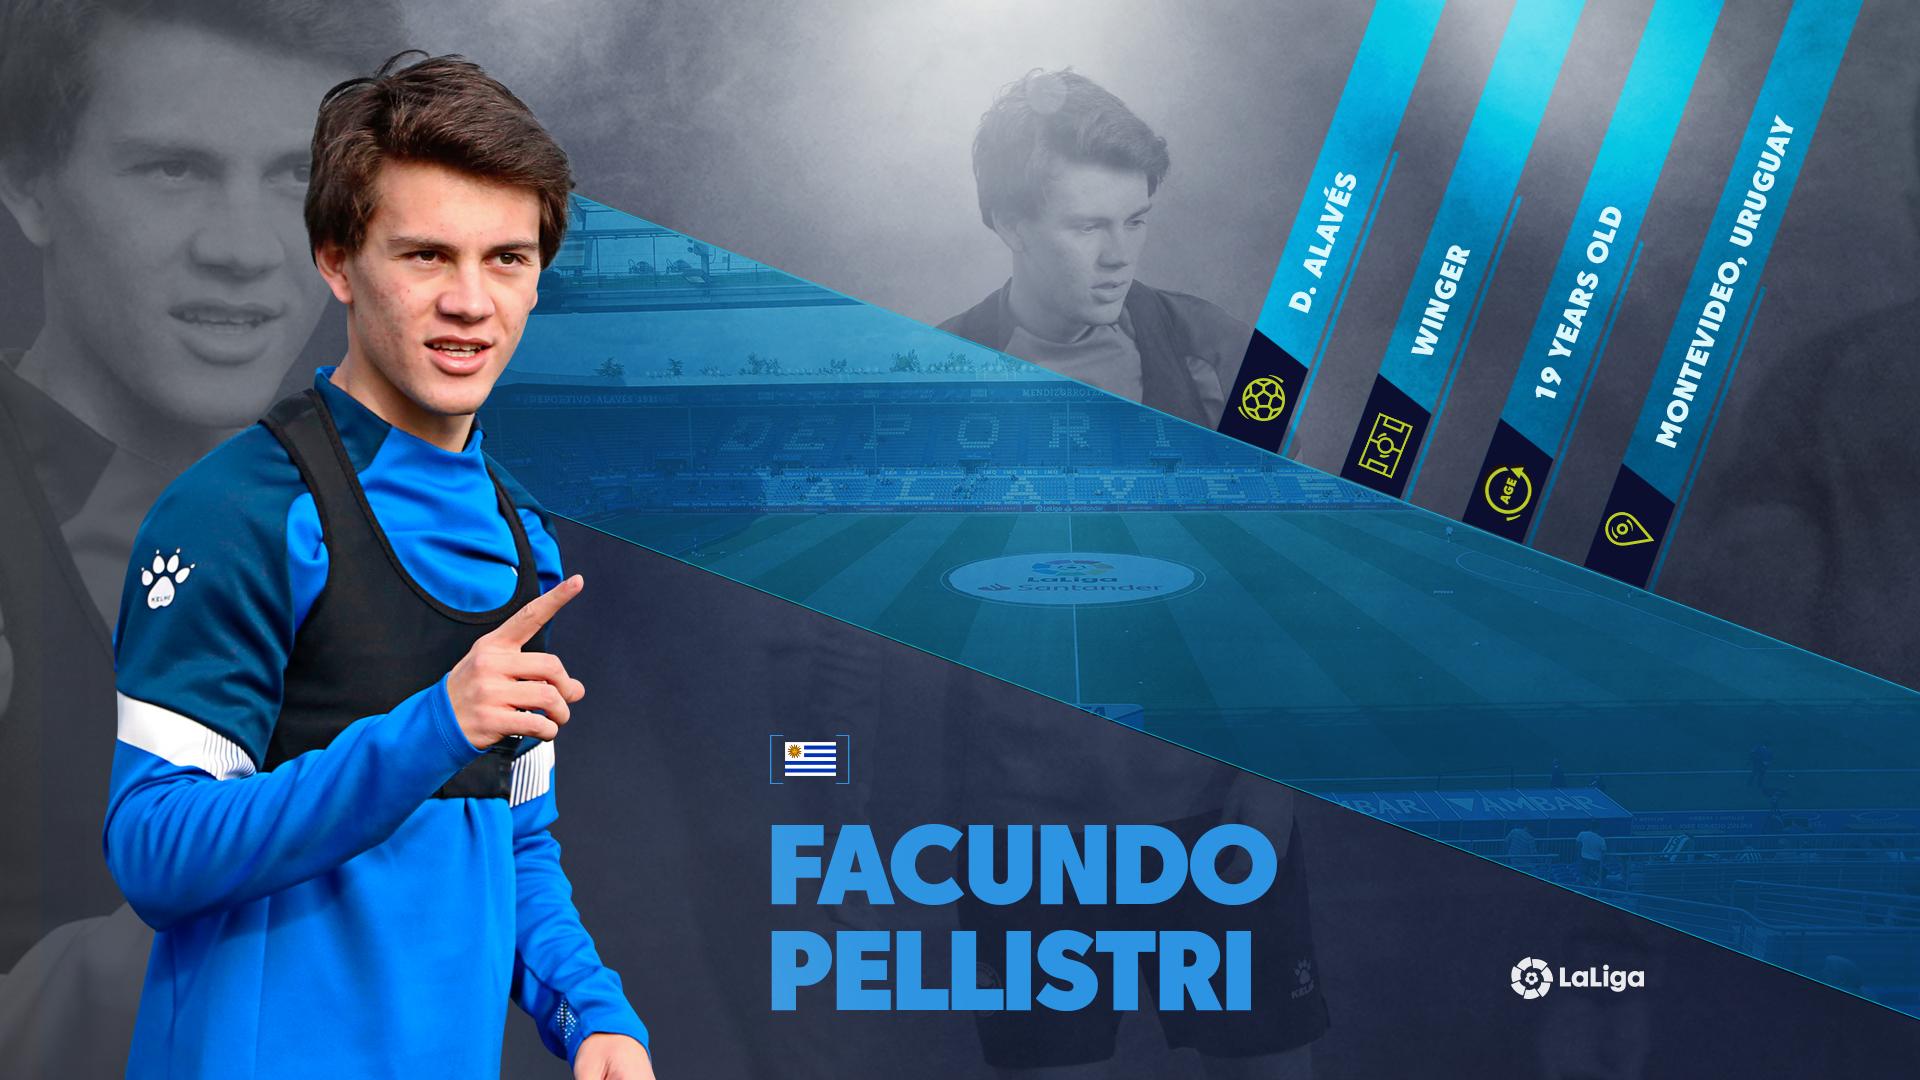 rising-star-Facundo-pellistri-ENG.jpg